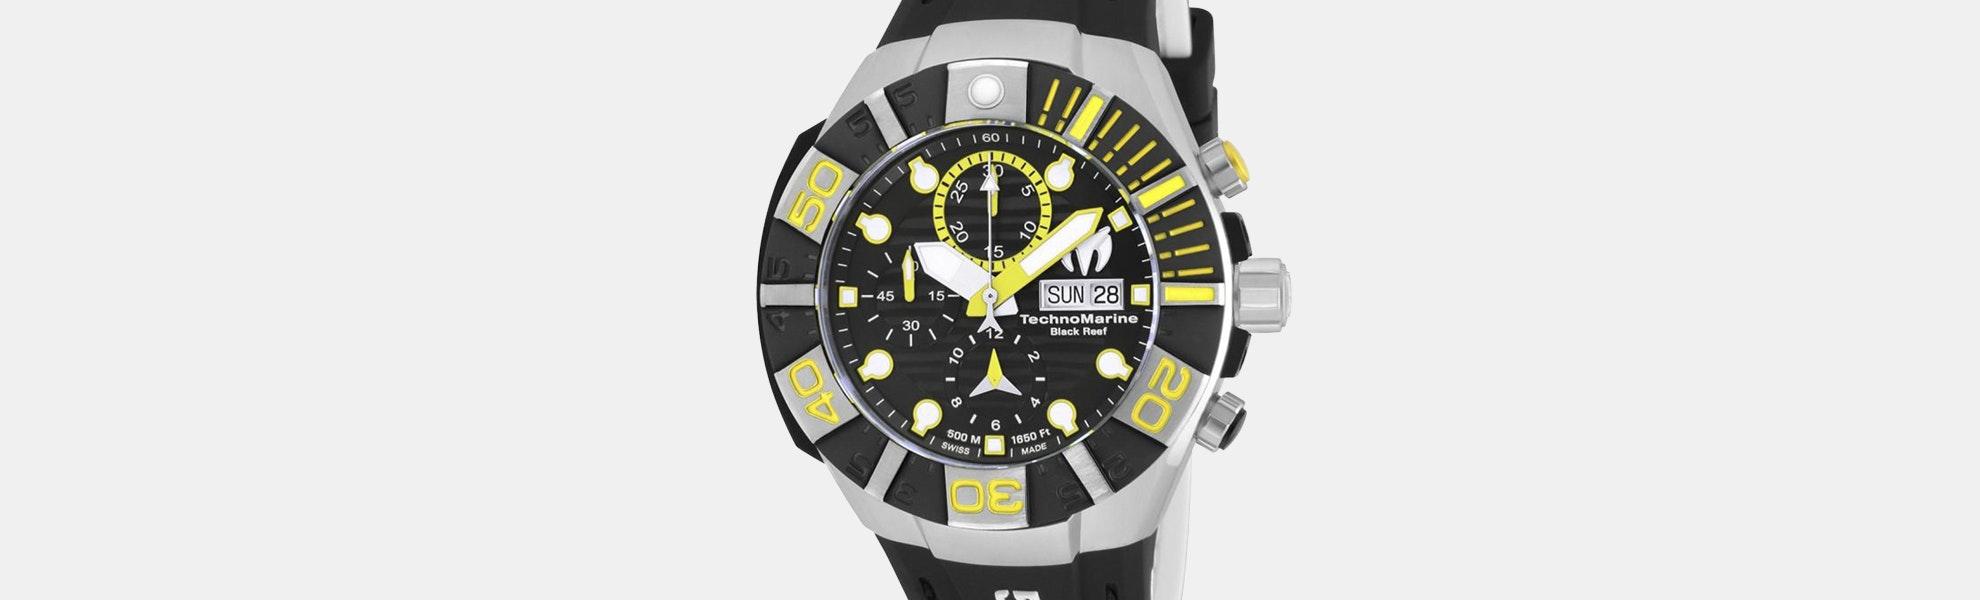 Technomarine Black Reef Automatic Watch